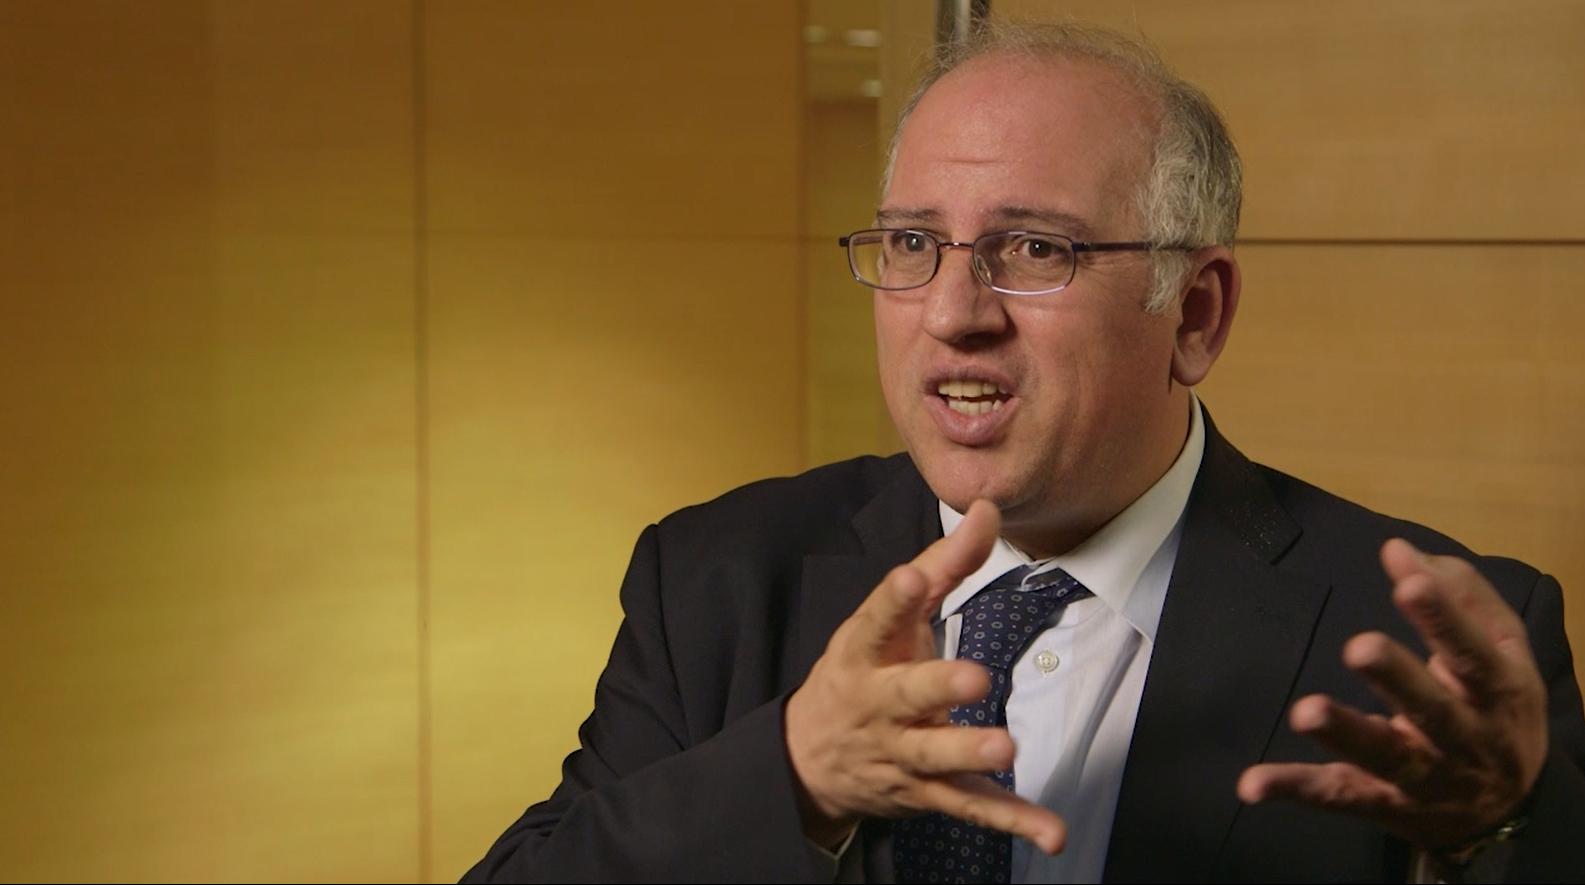 Paulo Ascierto – ECC 2015, Vienna – Part 3: PD-1 Pathway Immune Checkpoint Inhibitors